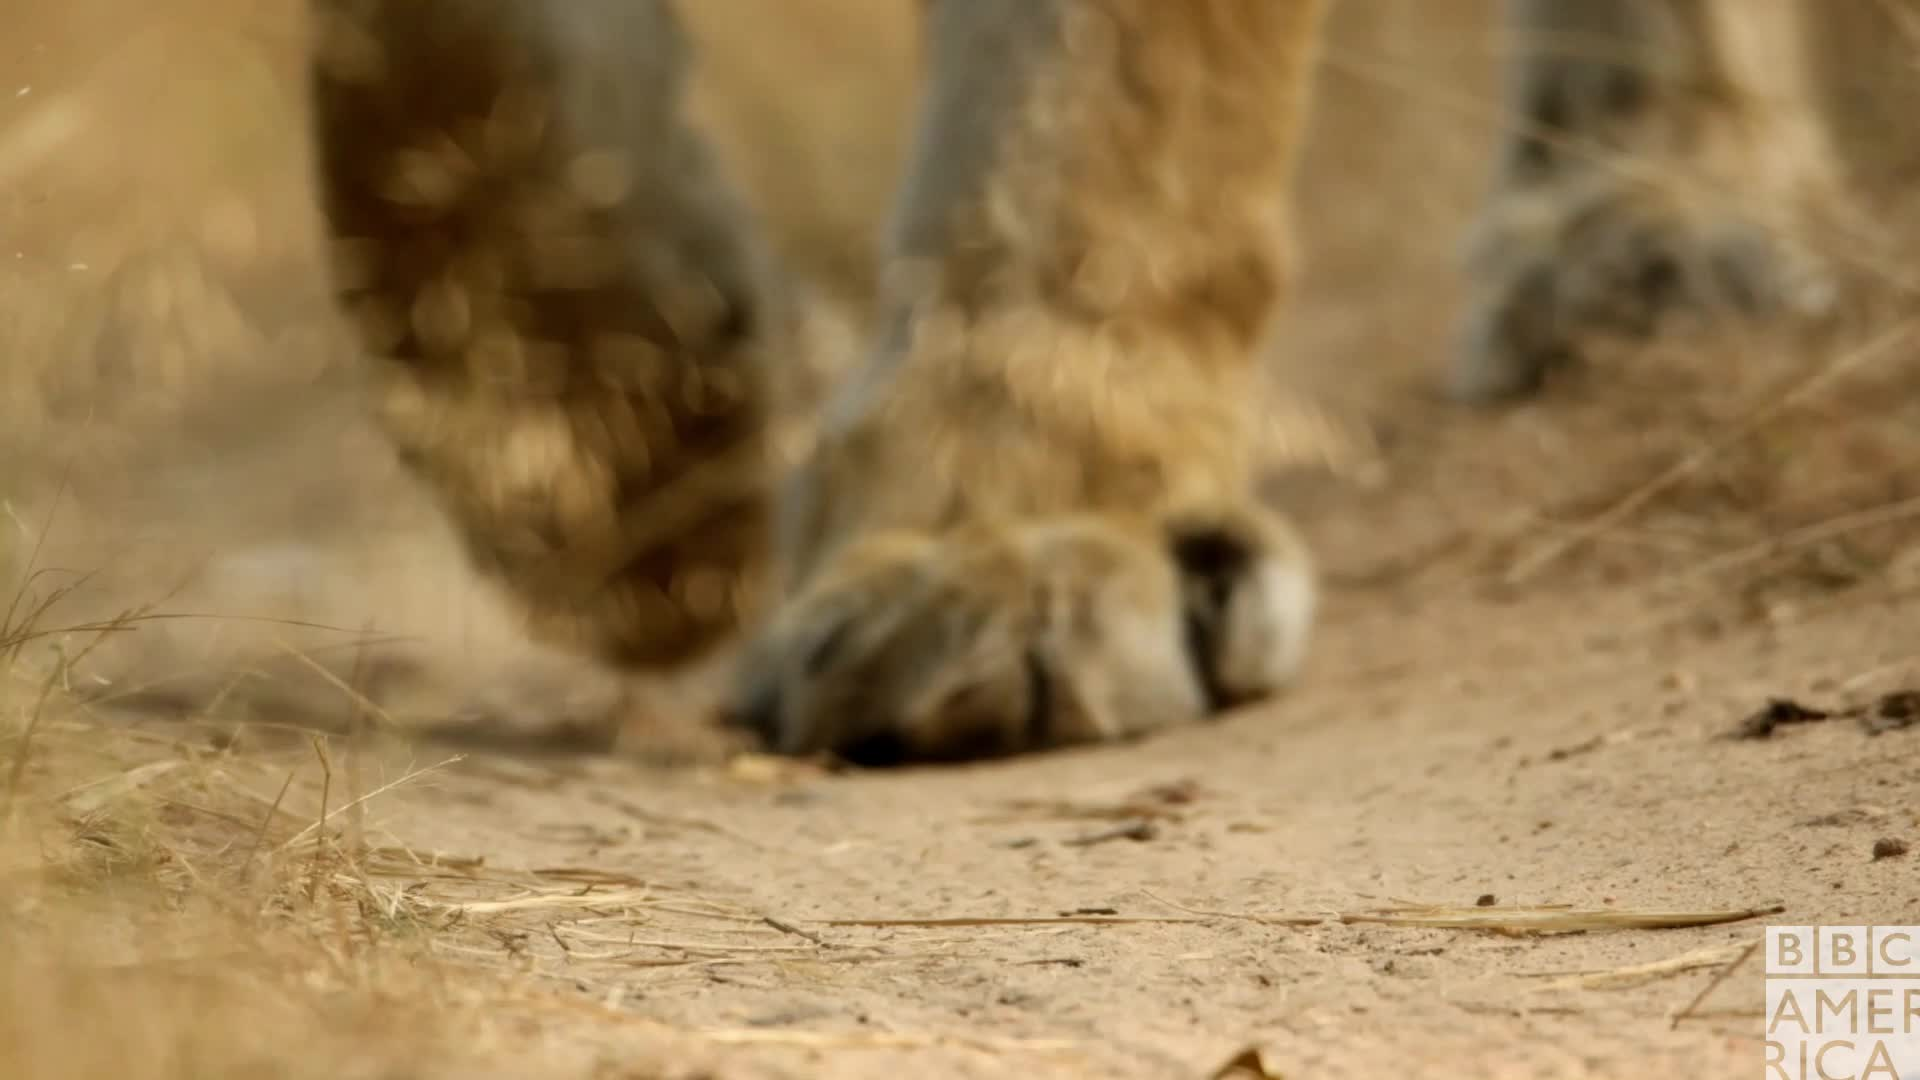 animal, animals, awww, bbc america, bbc america dynasties, bbc america: dynasties, cute, dynasties, tiger, tigers, Dynasties Tiger Paws GIFs